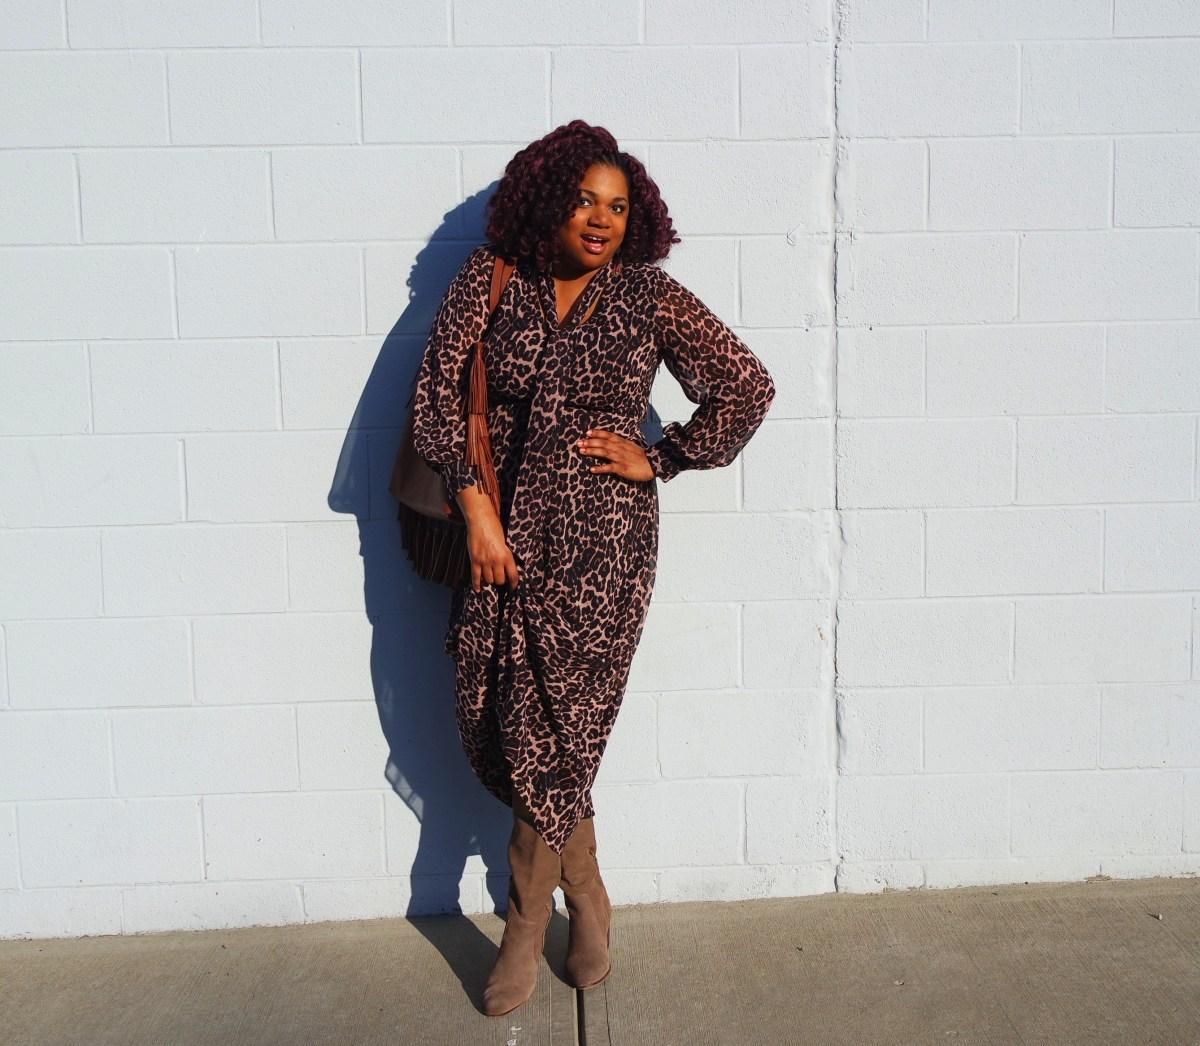 Style Sunday | 2 Ways To Wear Leopard Print